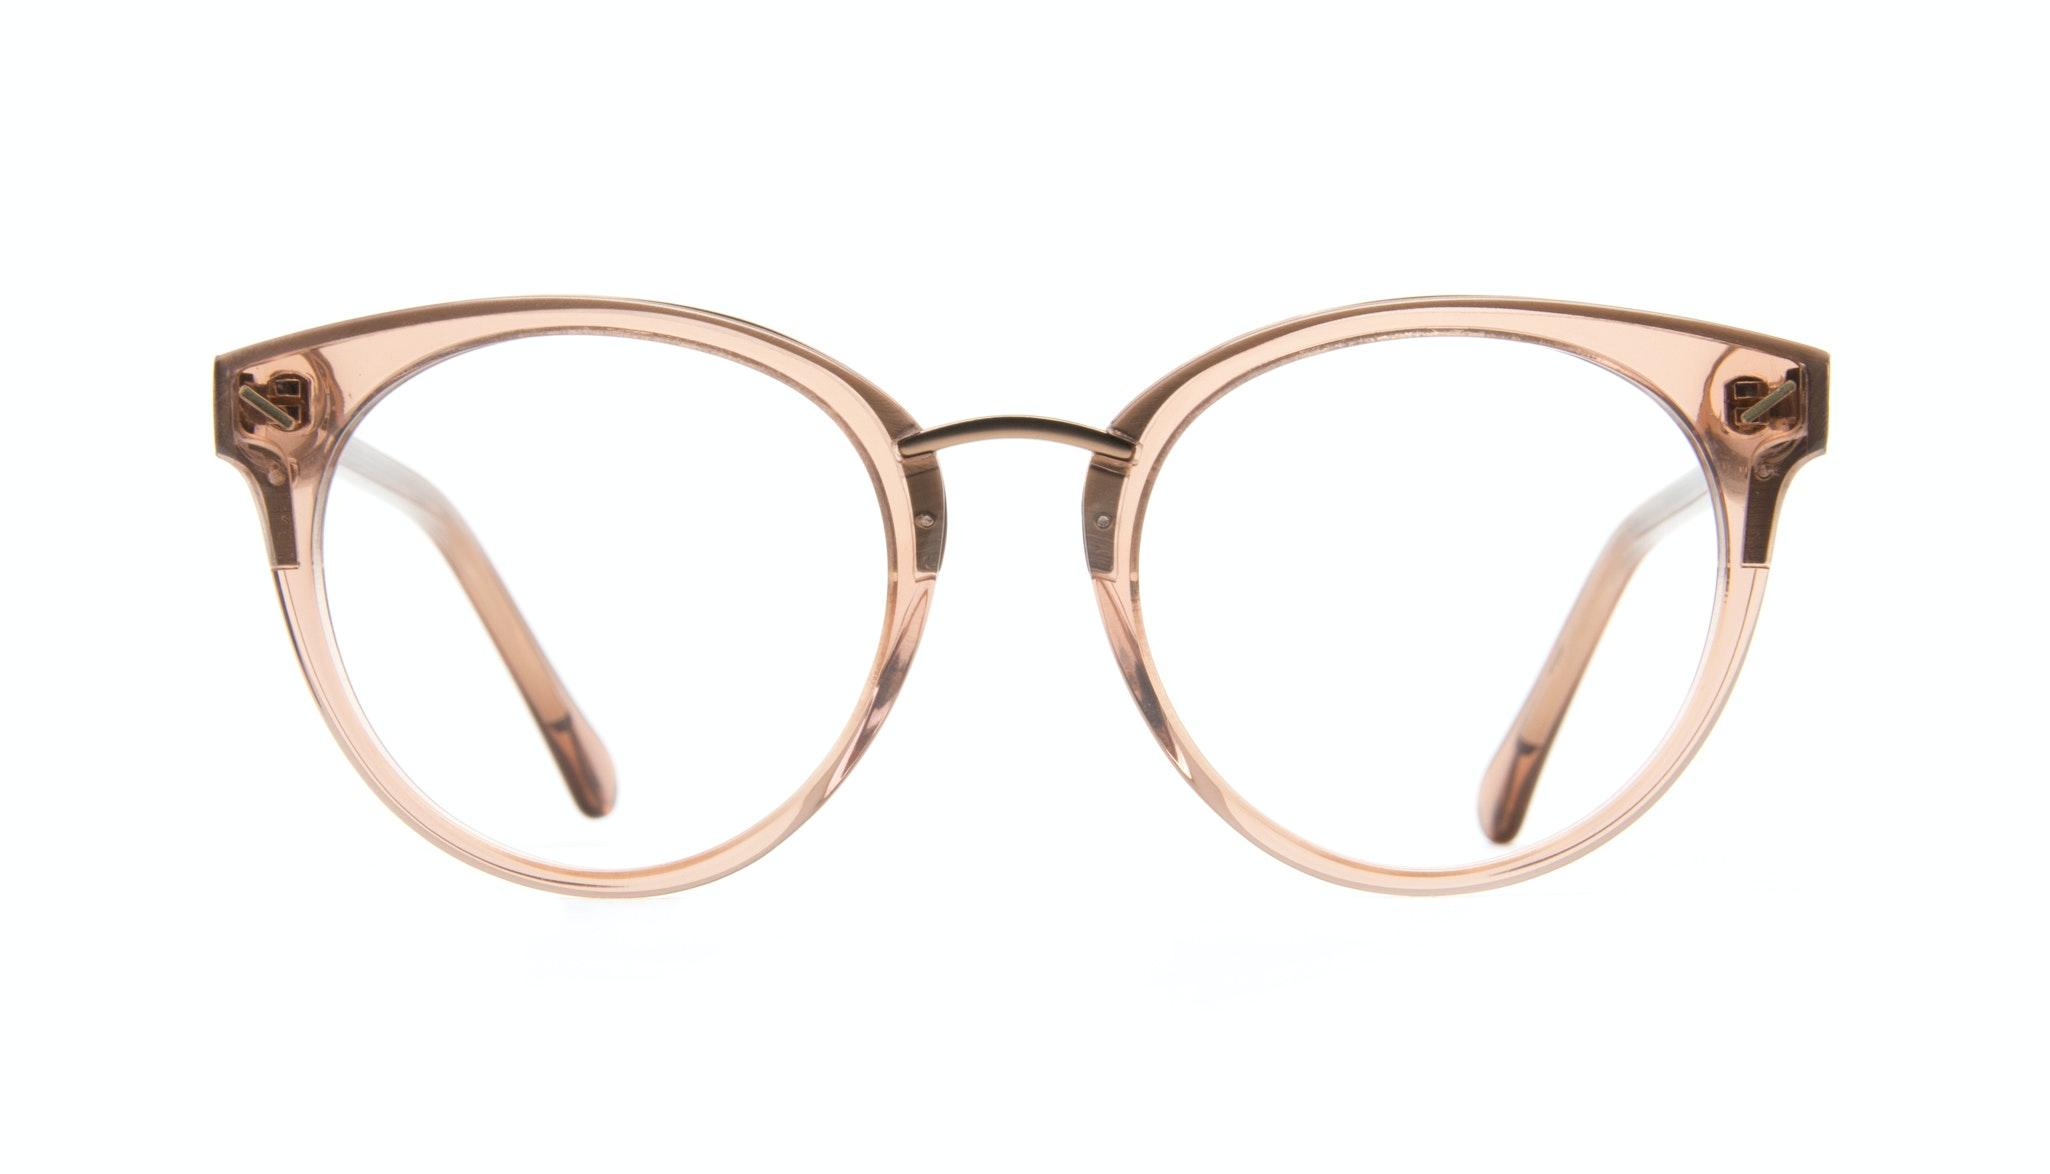 Affordable Fashion Glasses Round Eyeglasses Women Element Rose Front